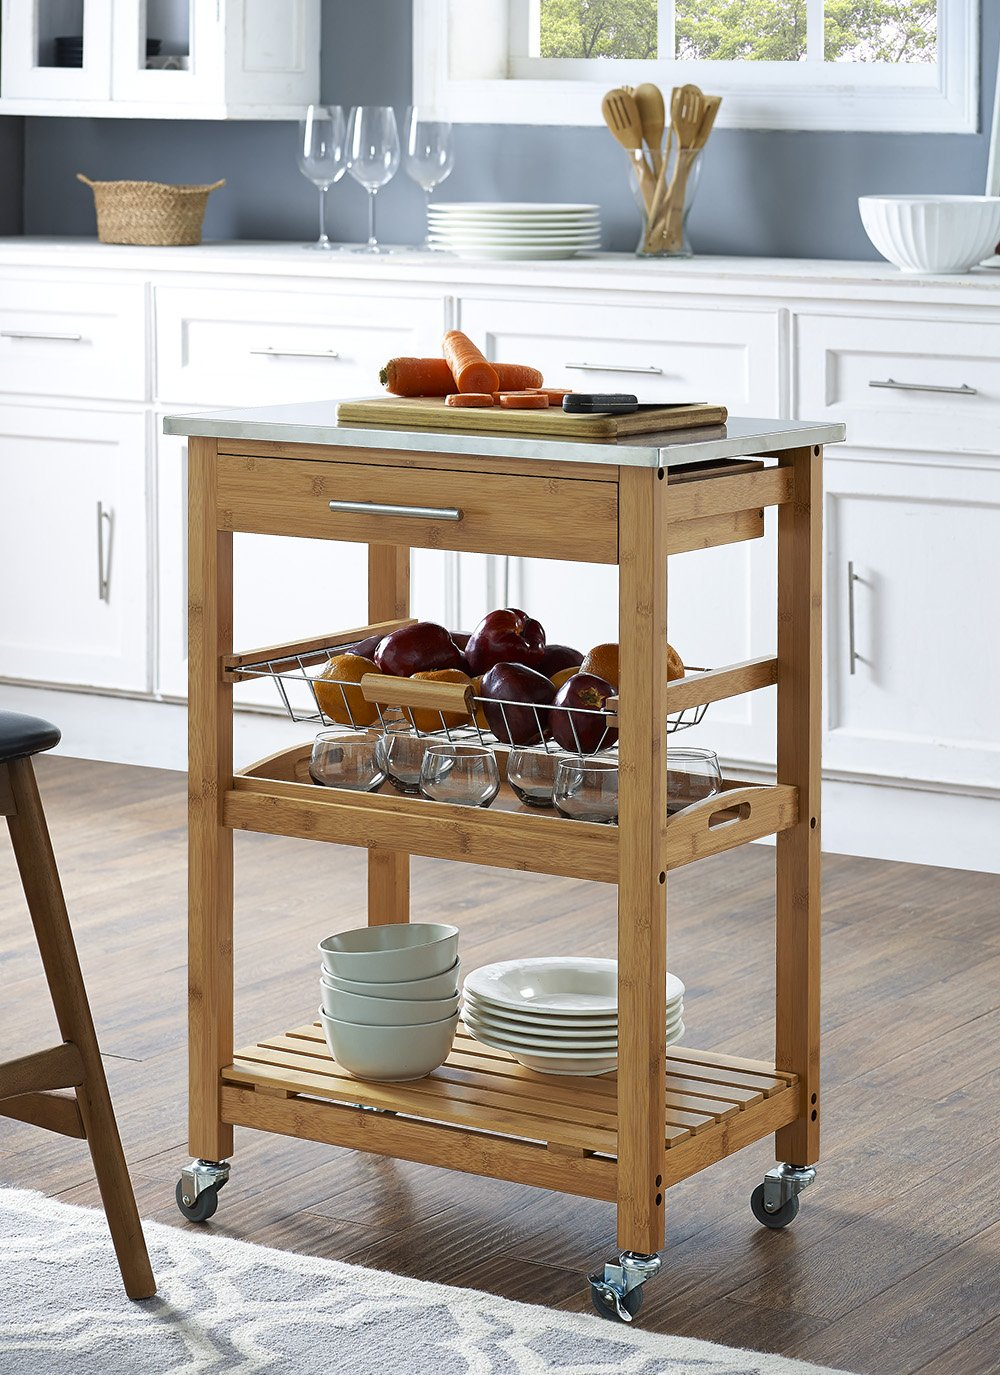 Amazon.com - Boraam 50651 Aya Bamboo Kitchen Cart with Stainless ...